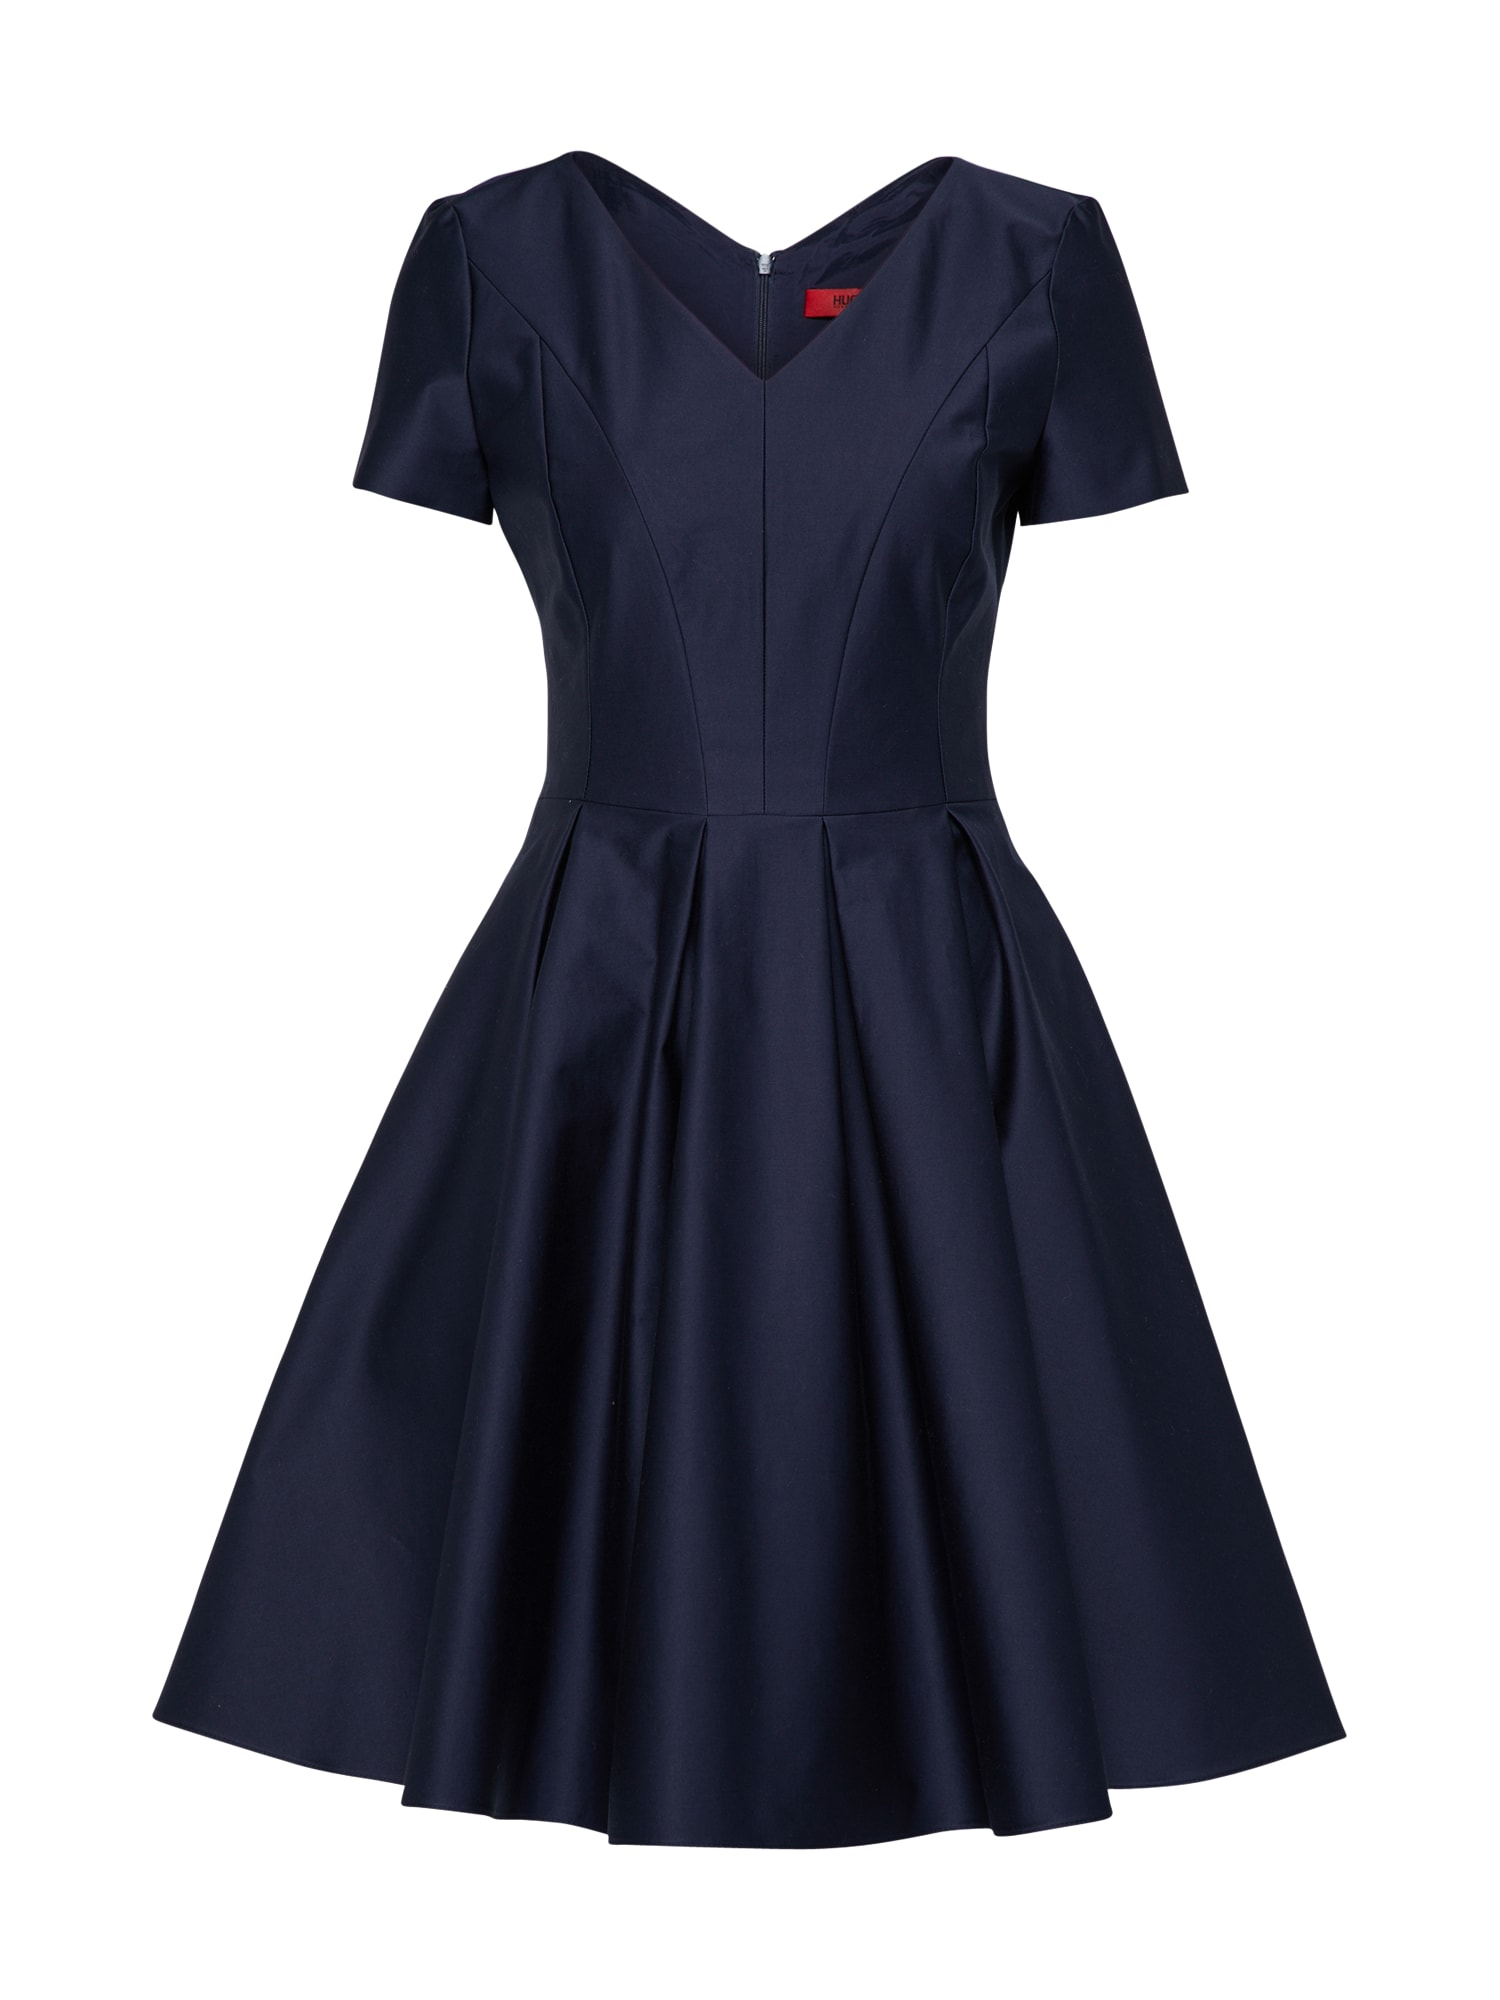 Koktejlové šaty Katemi marine modrá HUGO